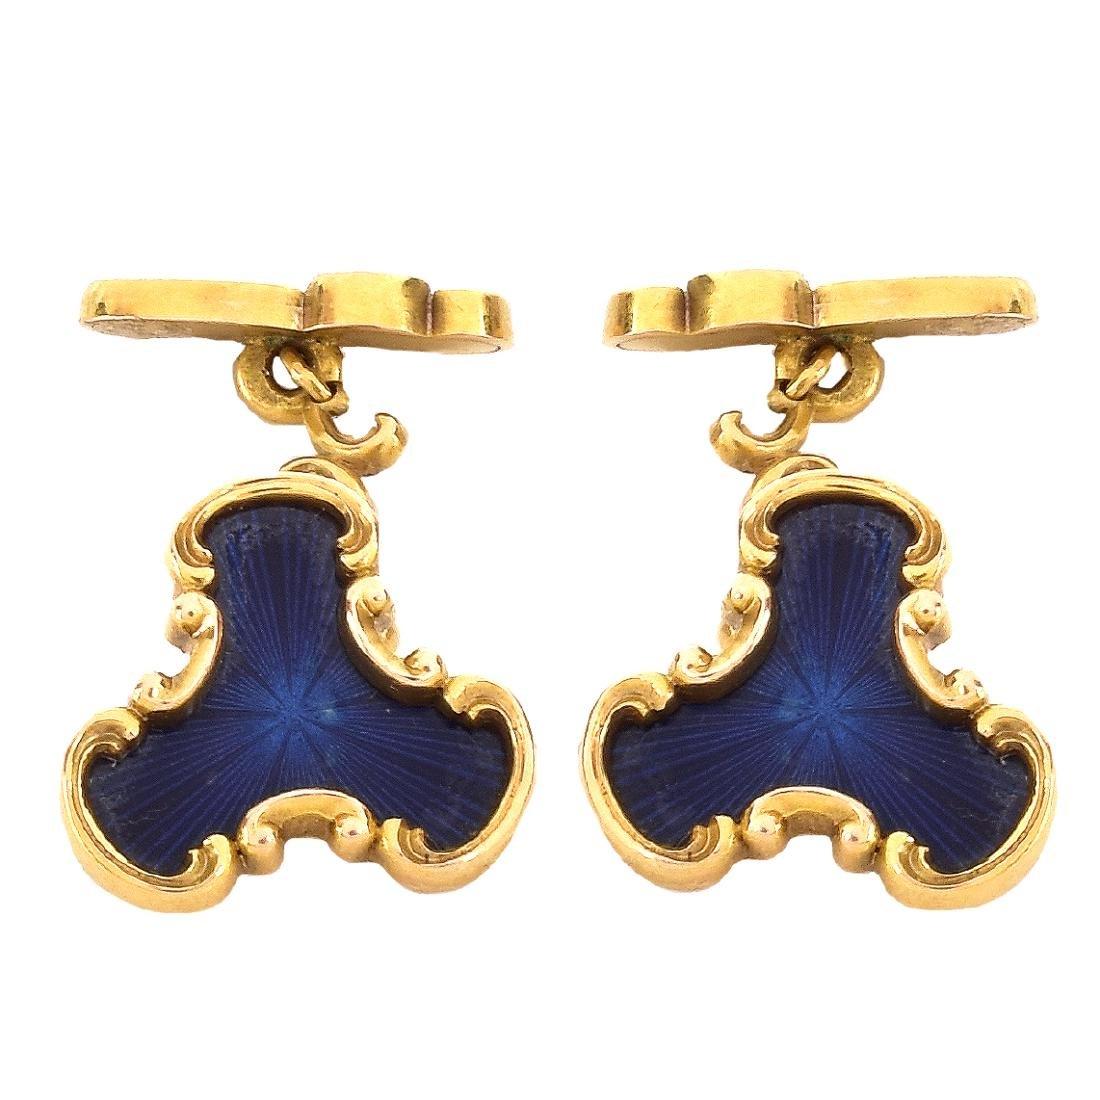 Russian Faberge Cufflinks - 2